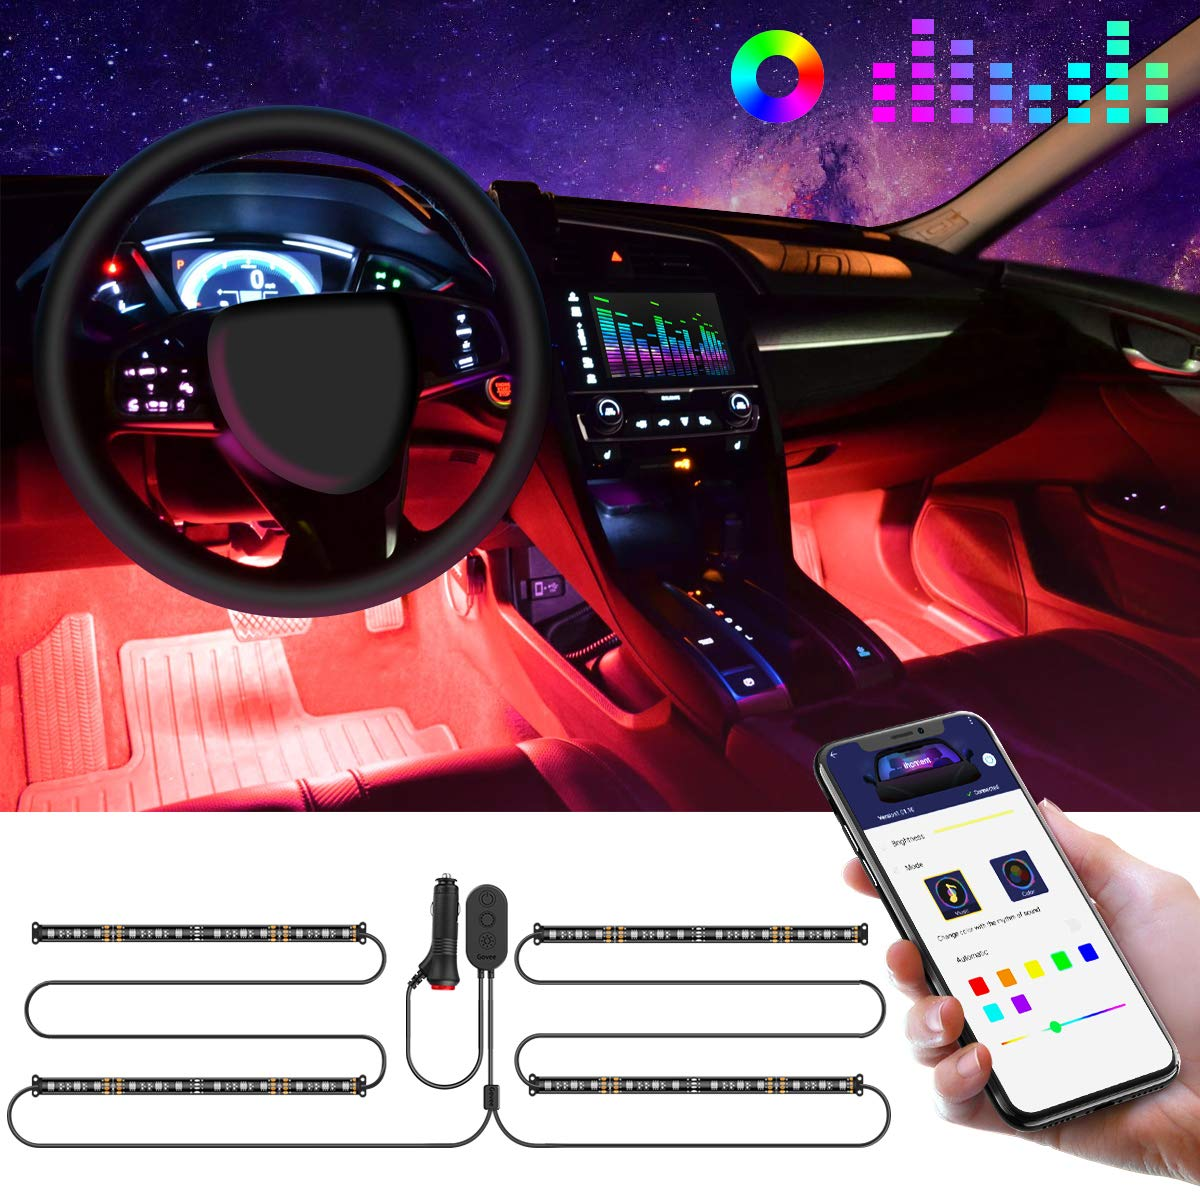 Led Lights For Cars >> Interior Car Lights Govee Car Led Strip Light Upgrade Two Line Design Waterproof 4pcs 48 Led App Controller Lighting Kits Multi Diy Color Music